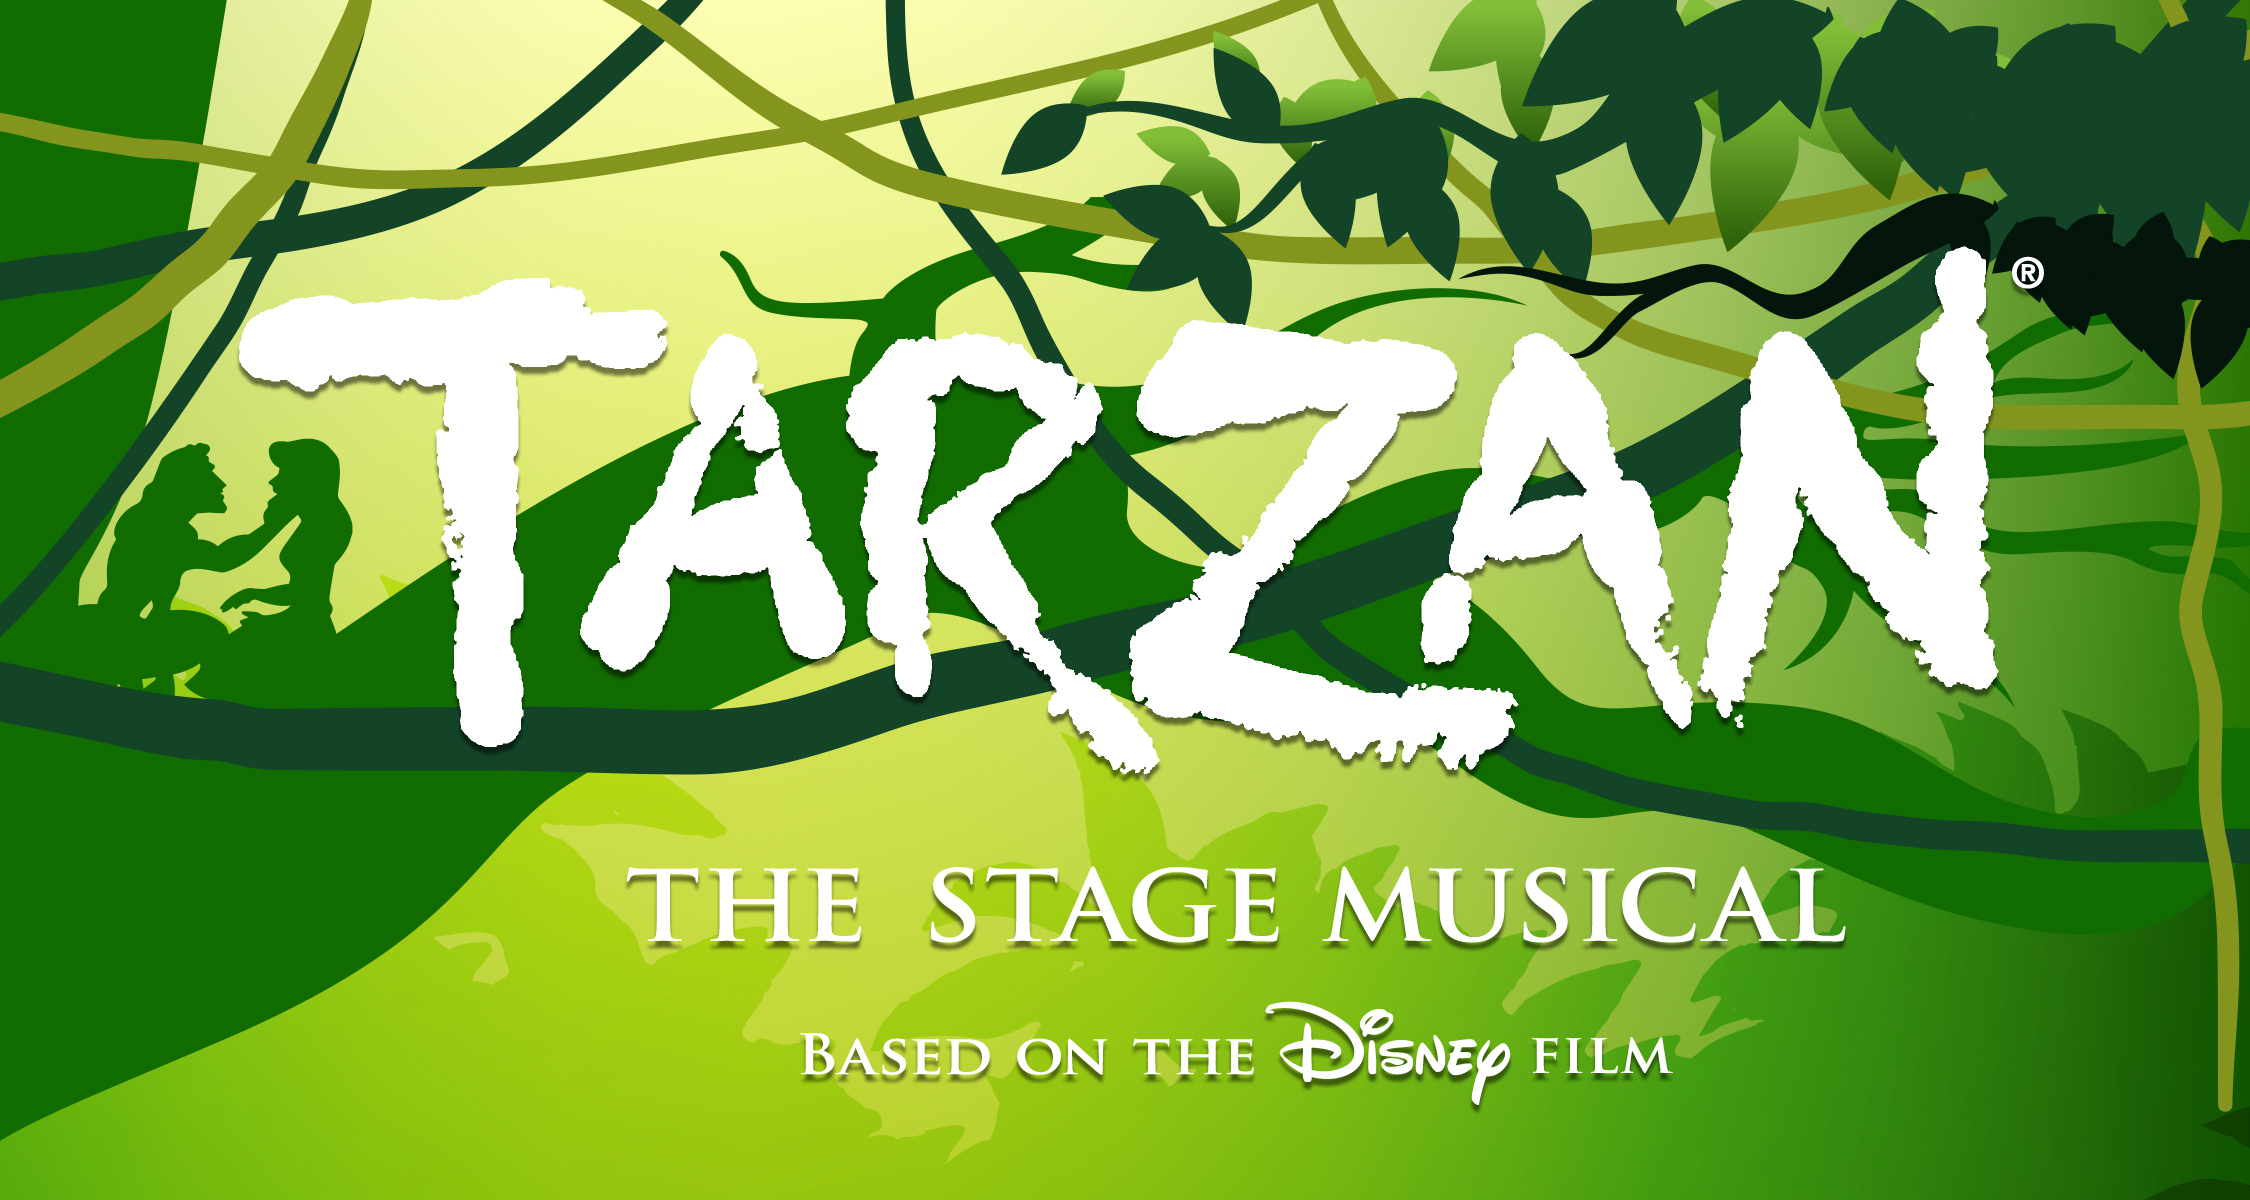 Tarzan 2 2019 online dating